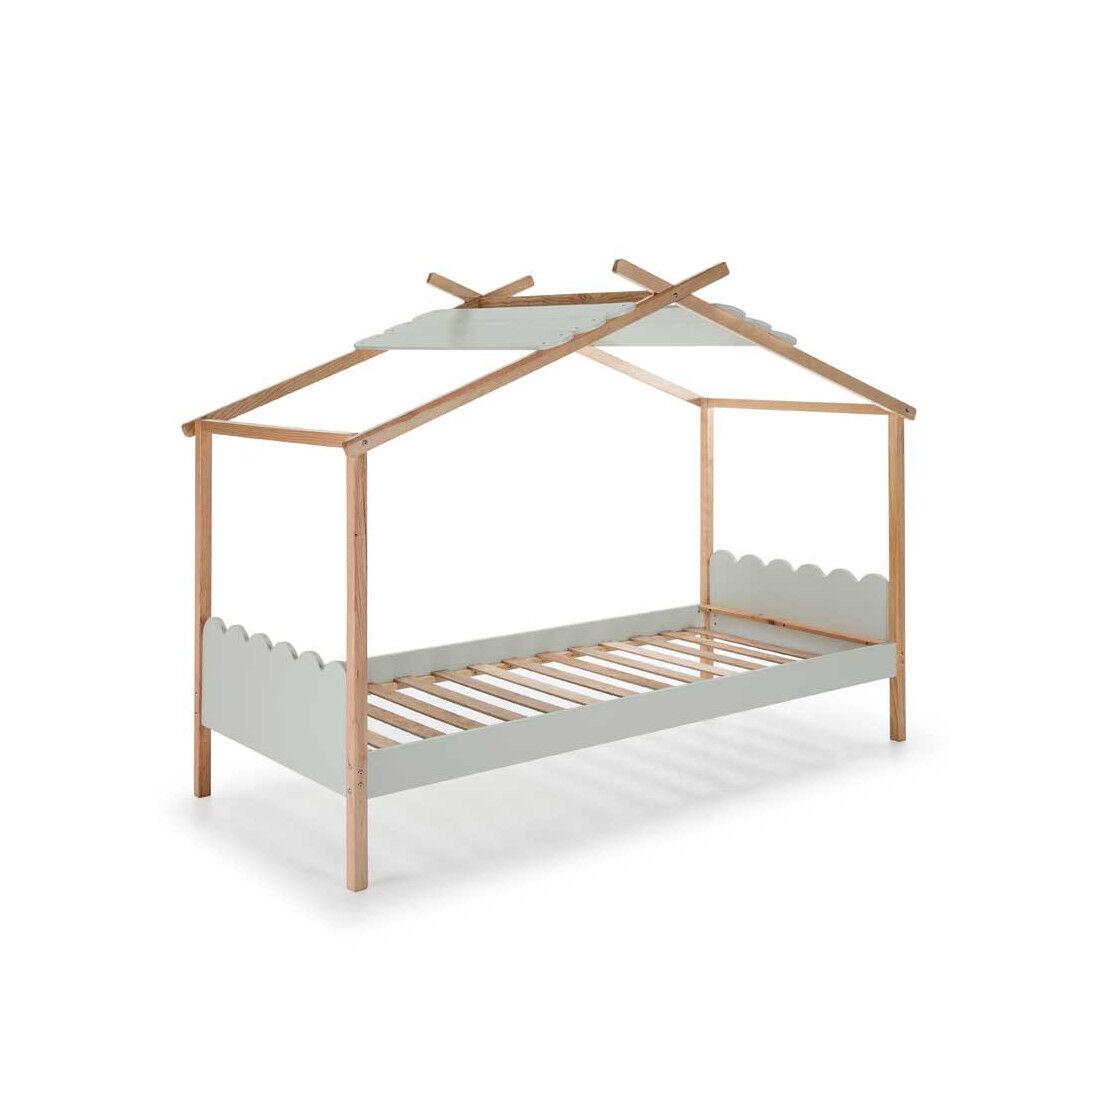 Tousmesmeubles Lit cabane 90*190 cm Gris/Bois - ROBIN - L 217 x l 110 x H 171